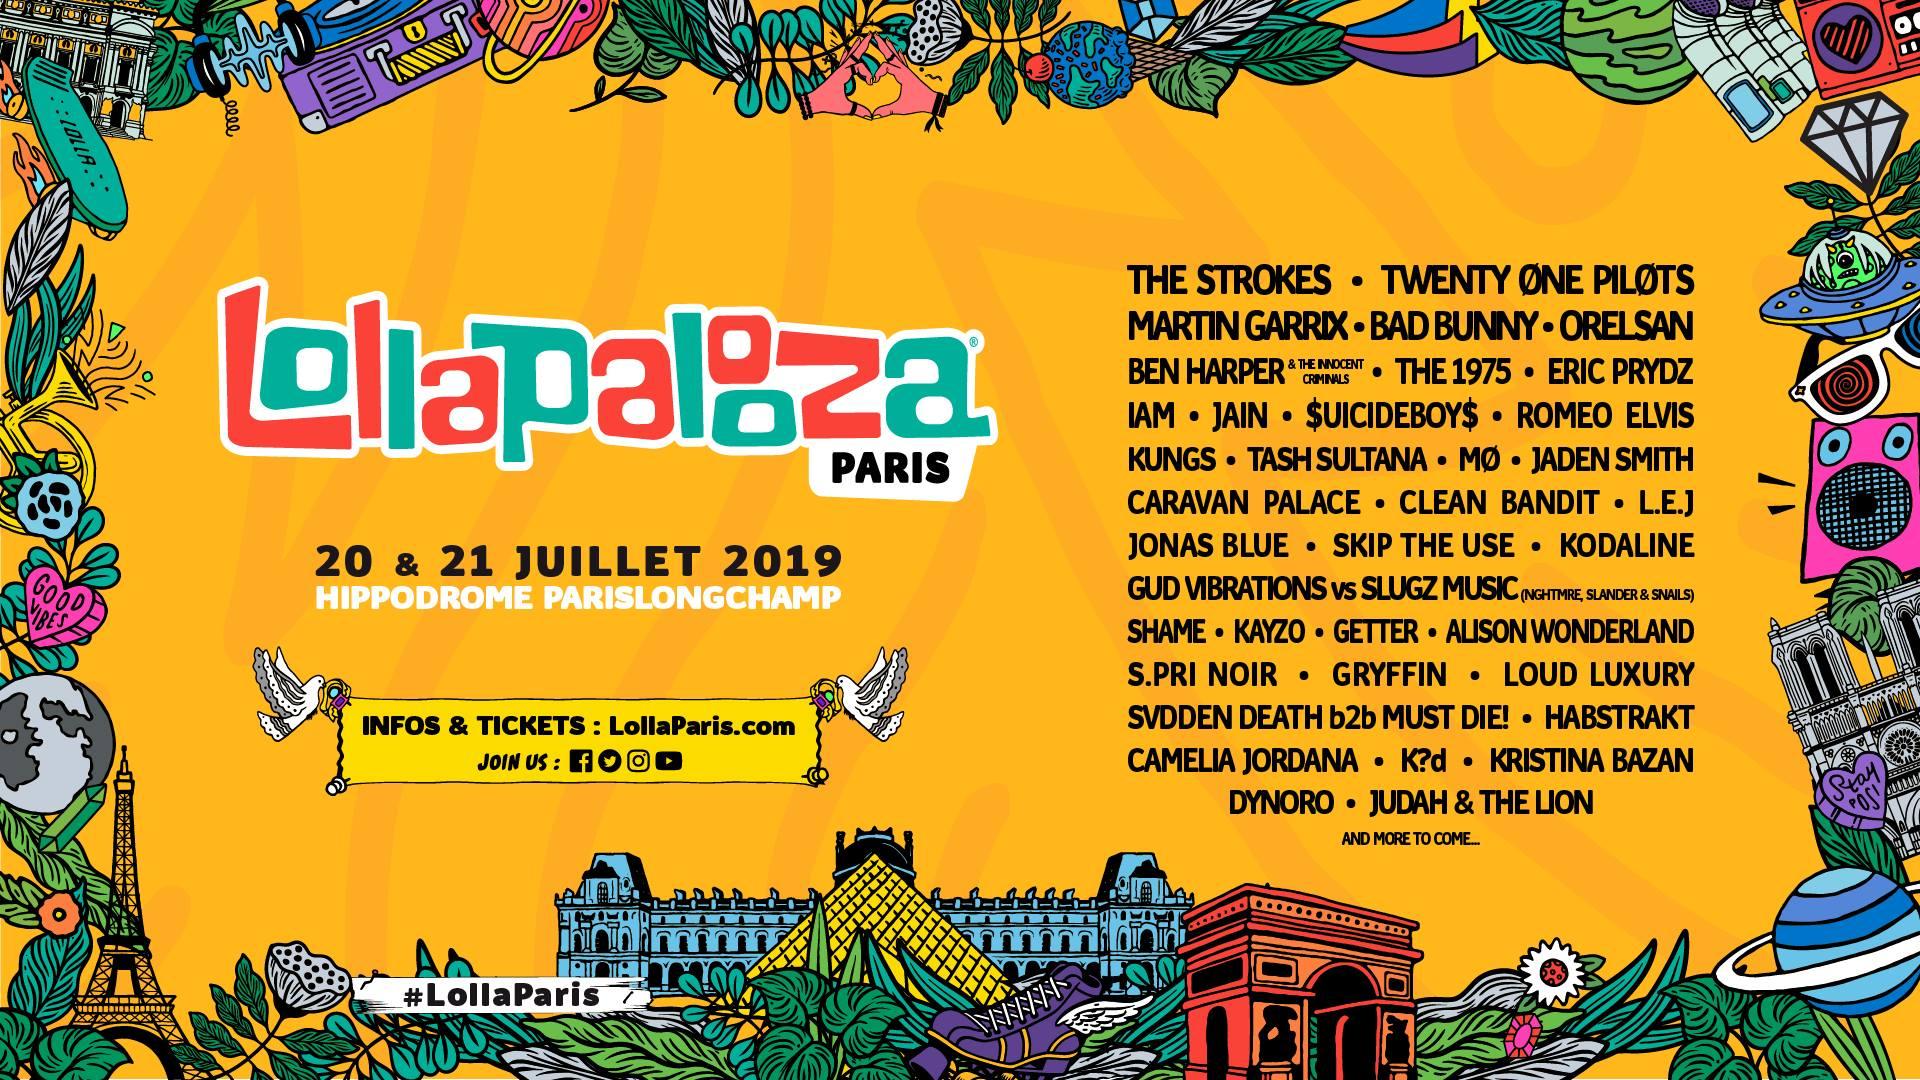 Lollapalooza 2019 ban jpg